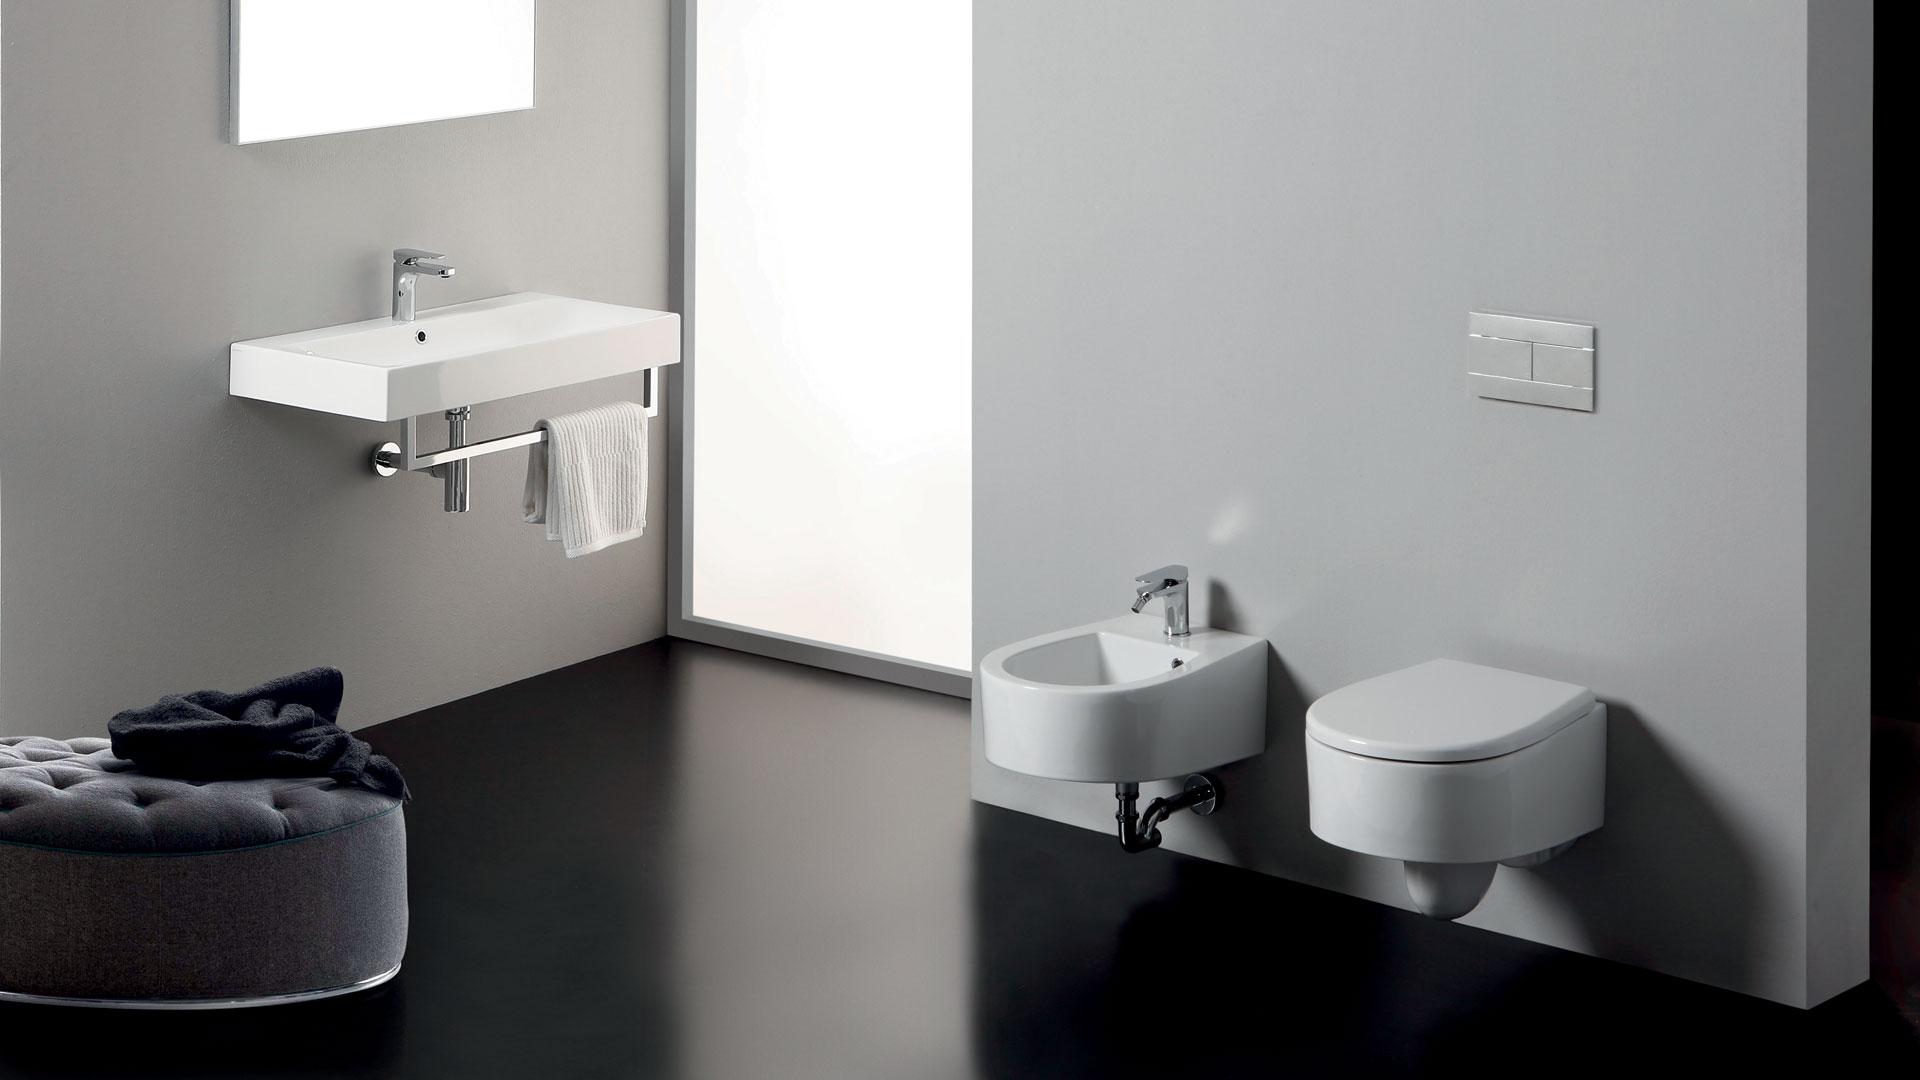 Vasca Da Bagno Kerasan : Sanitari bagno filo muro a terra vaso wc coprivaso bidet flo